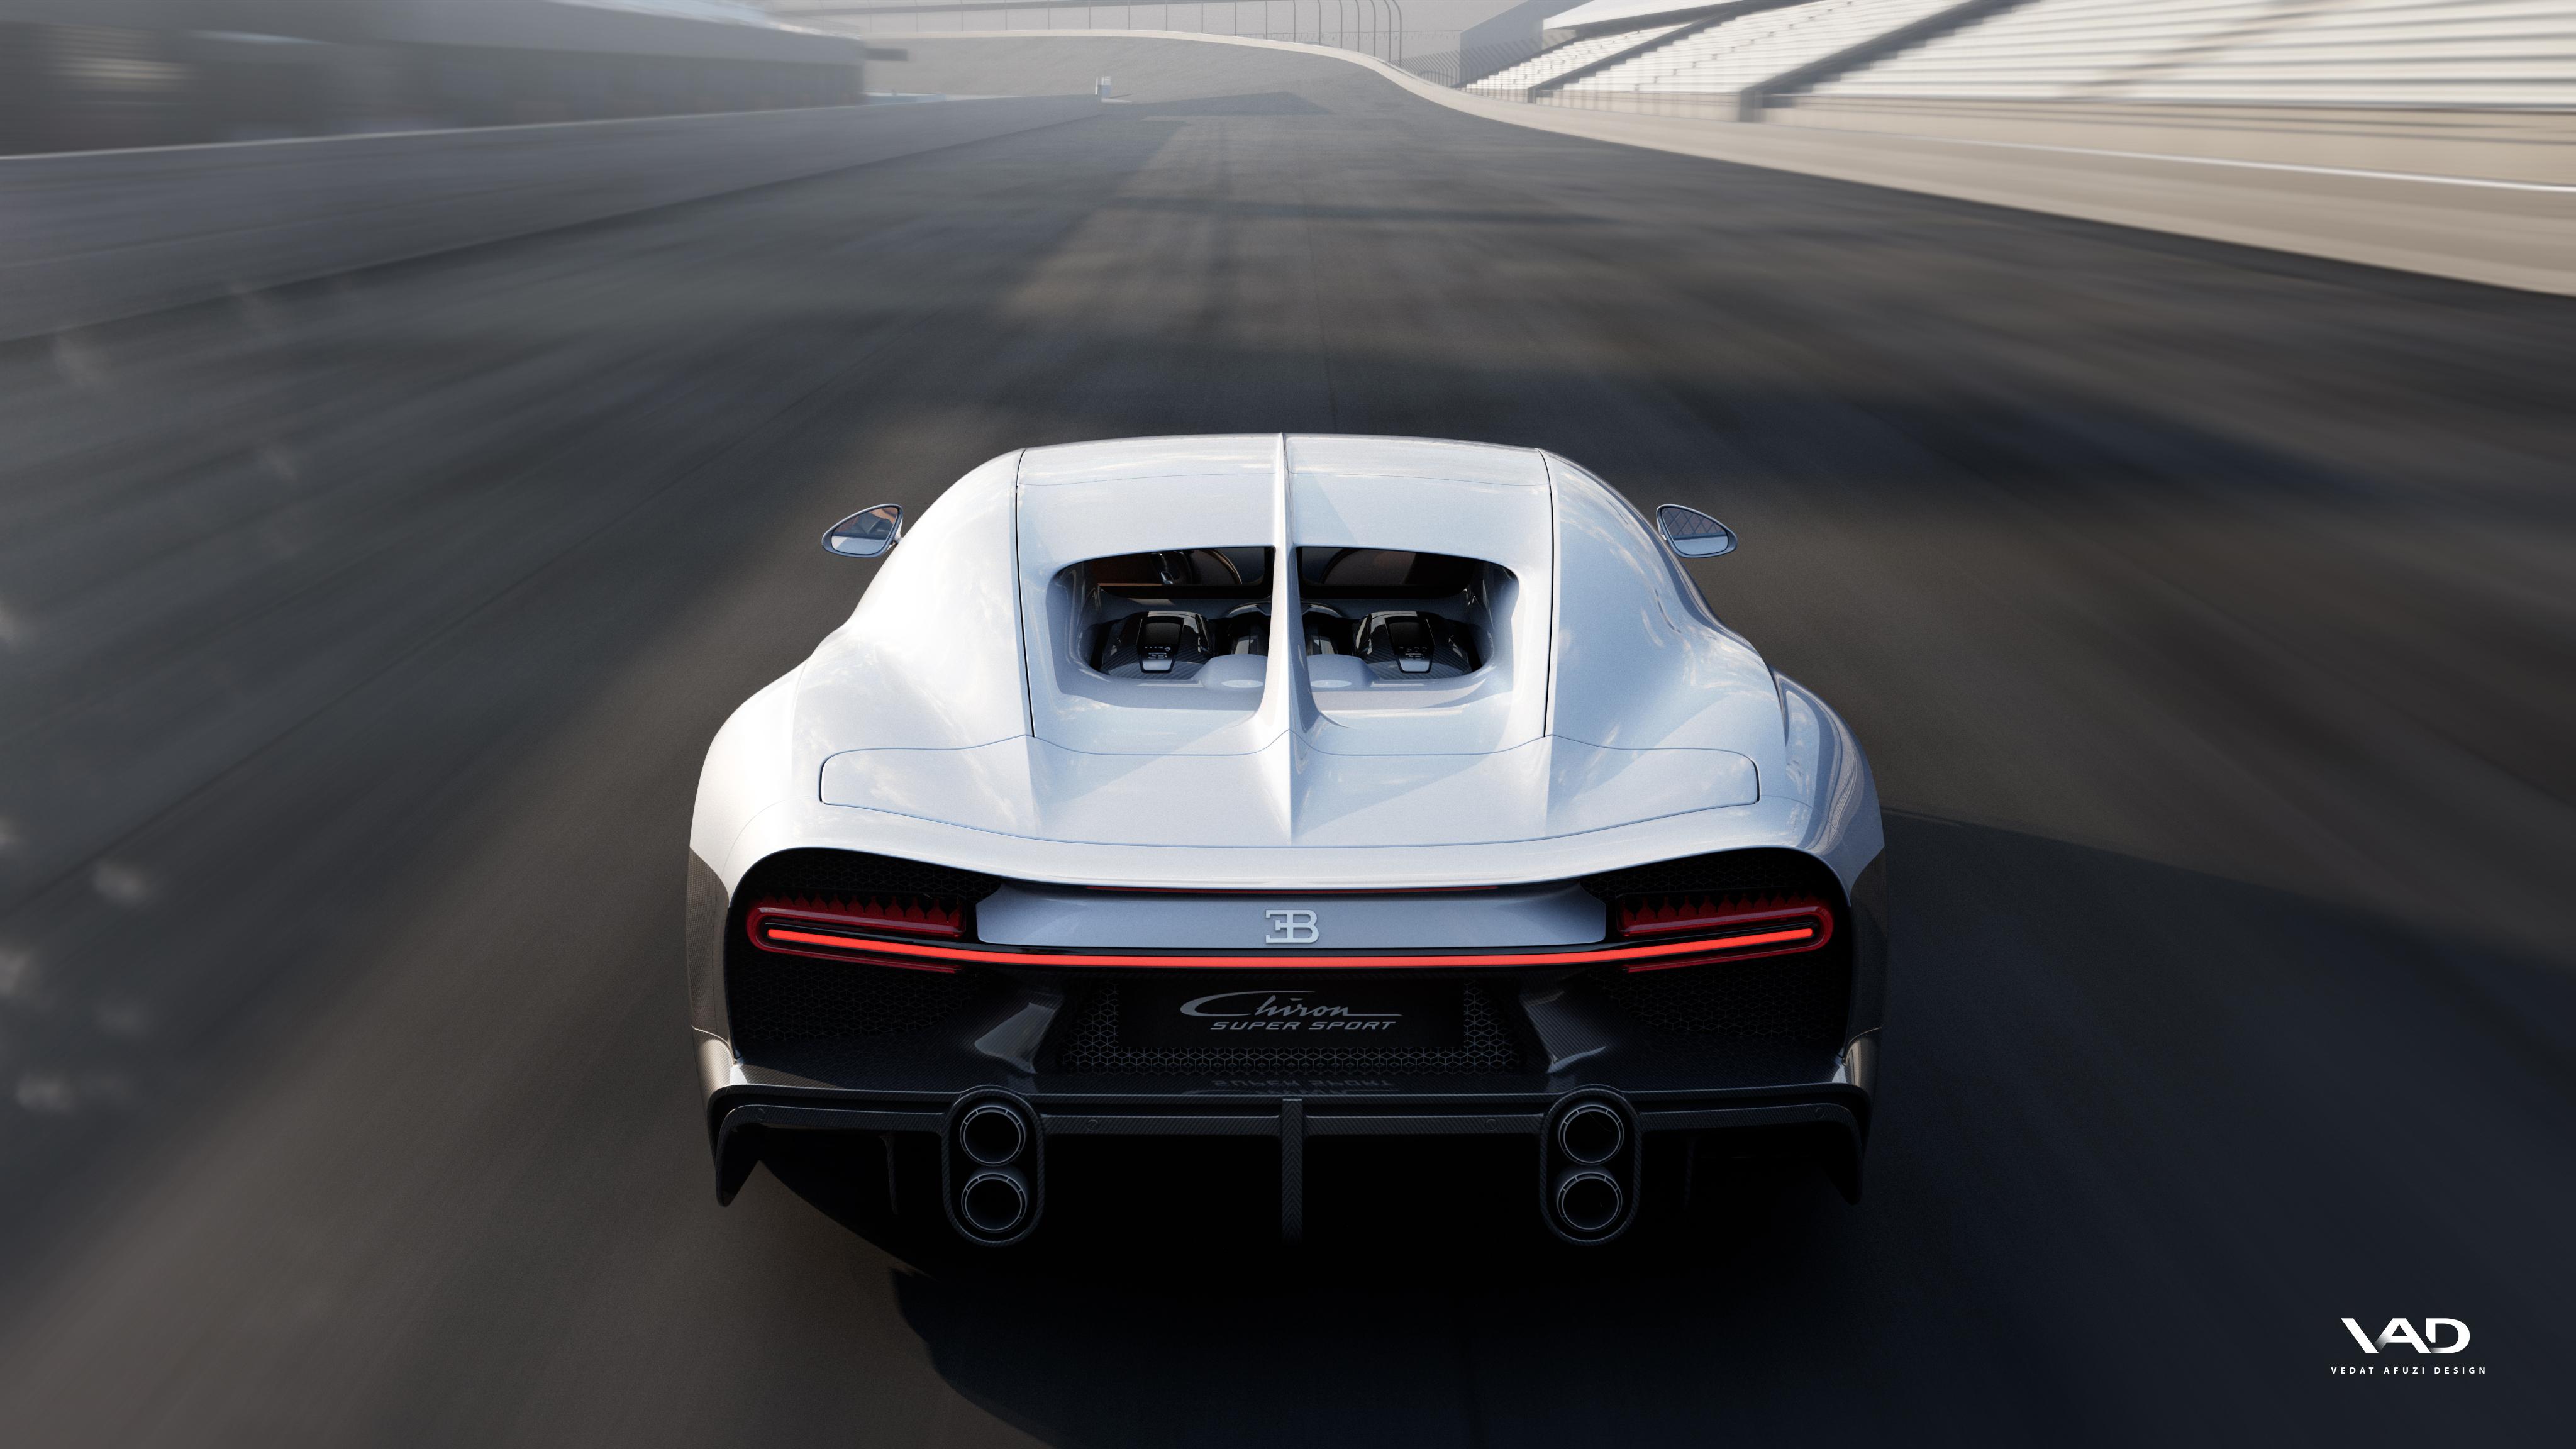 Bugatti Chiron Super Sport - High Speed Oval